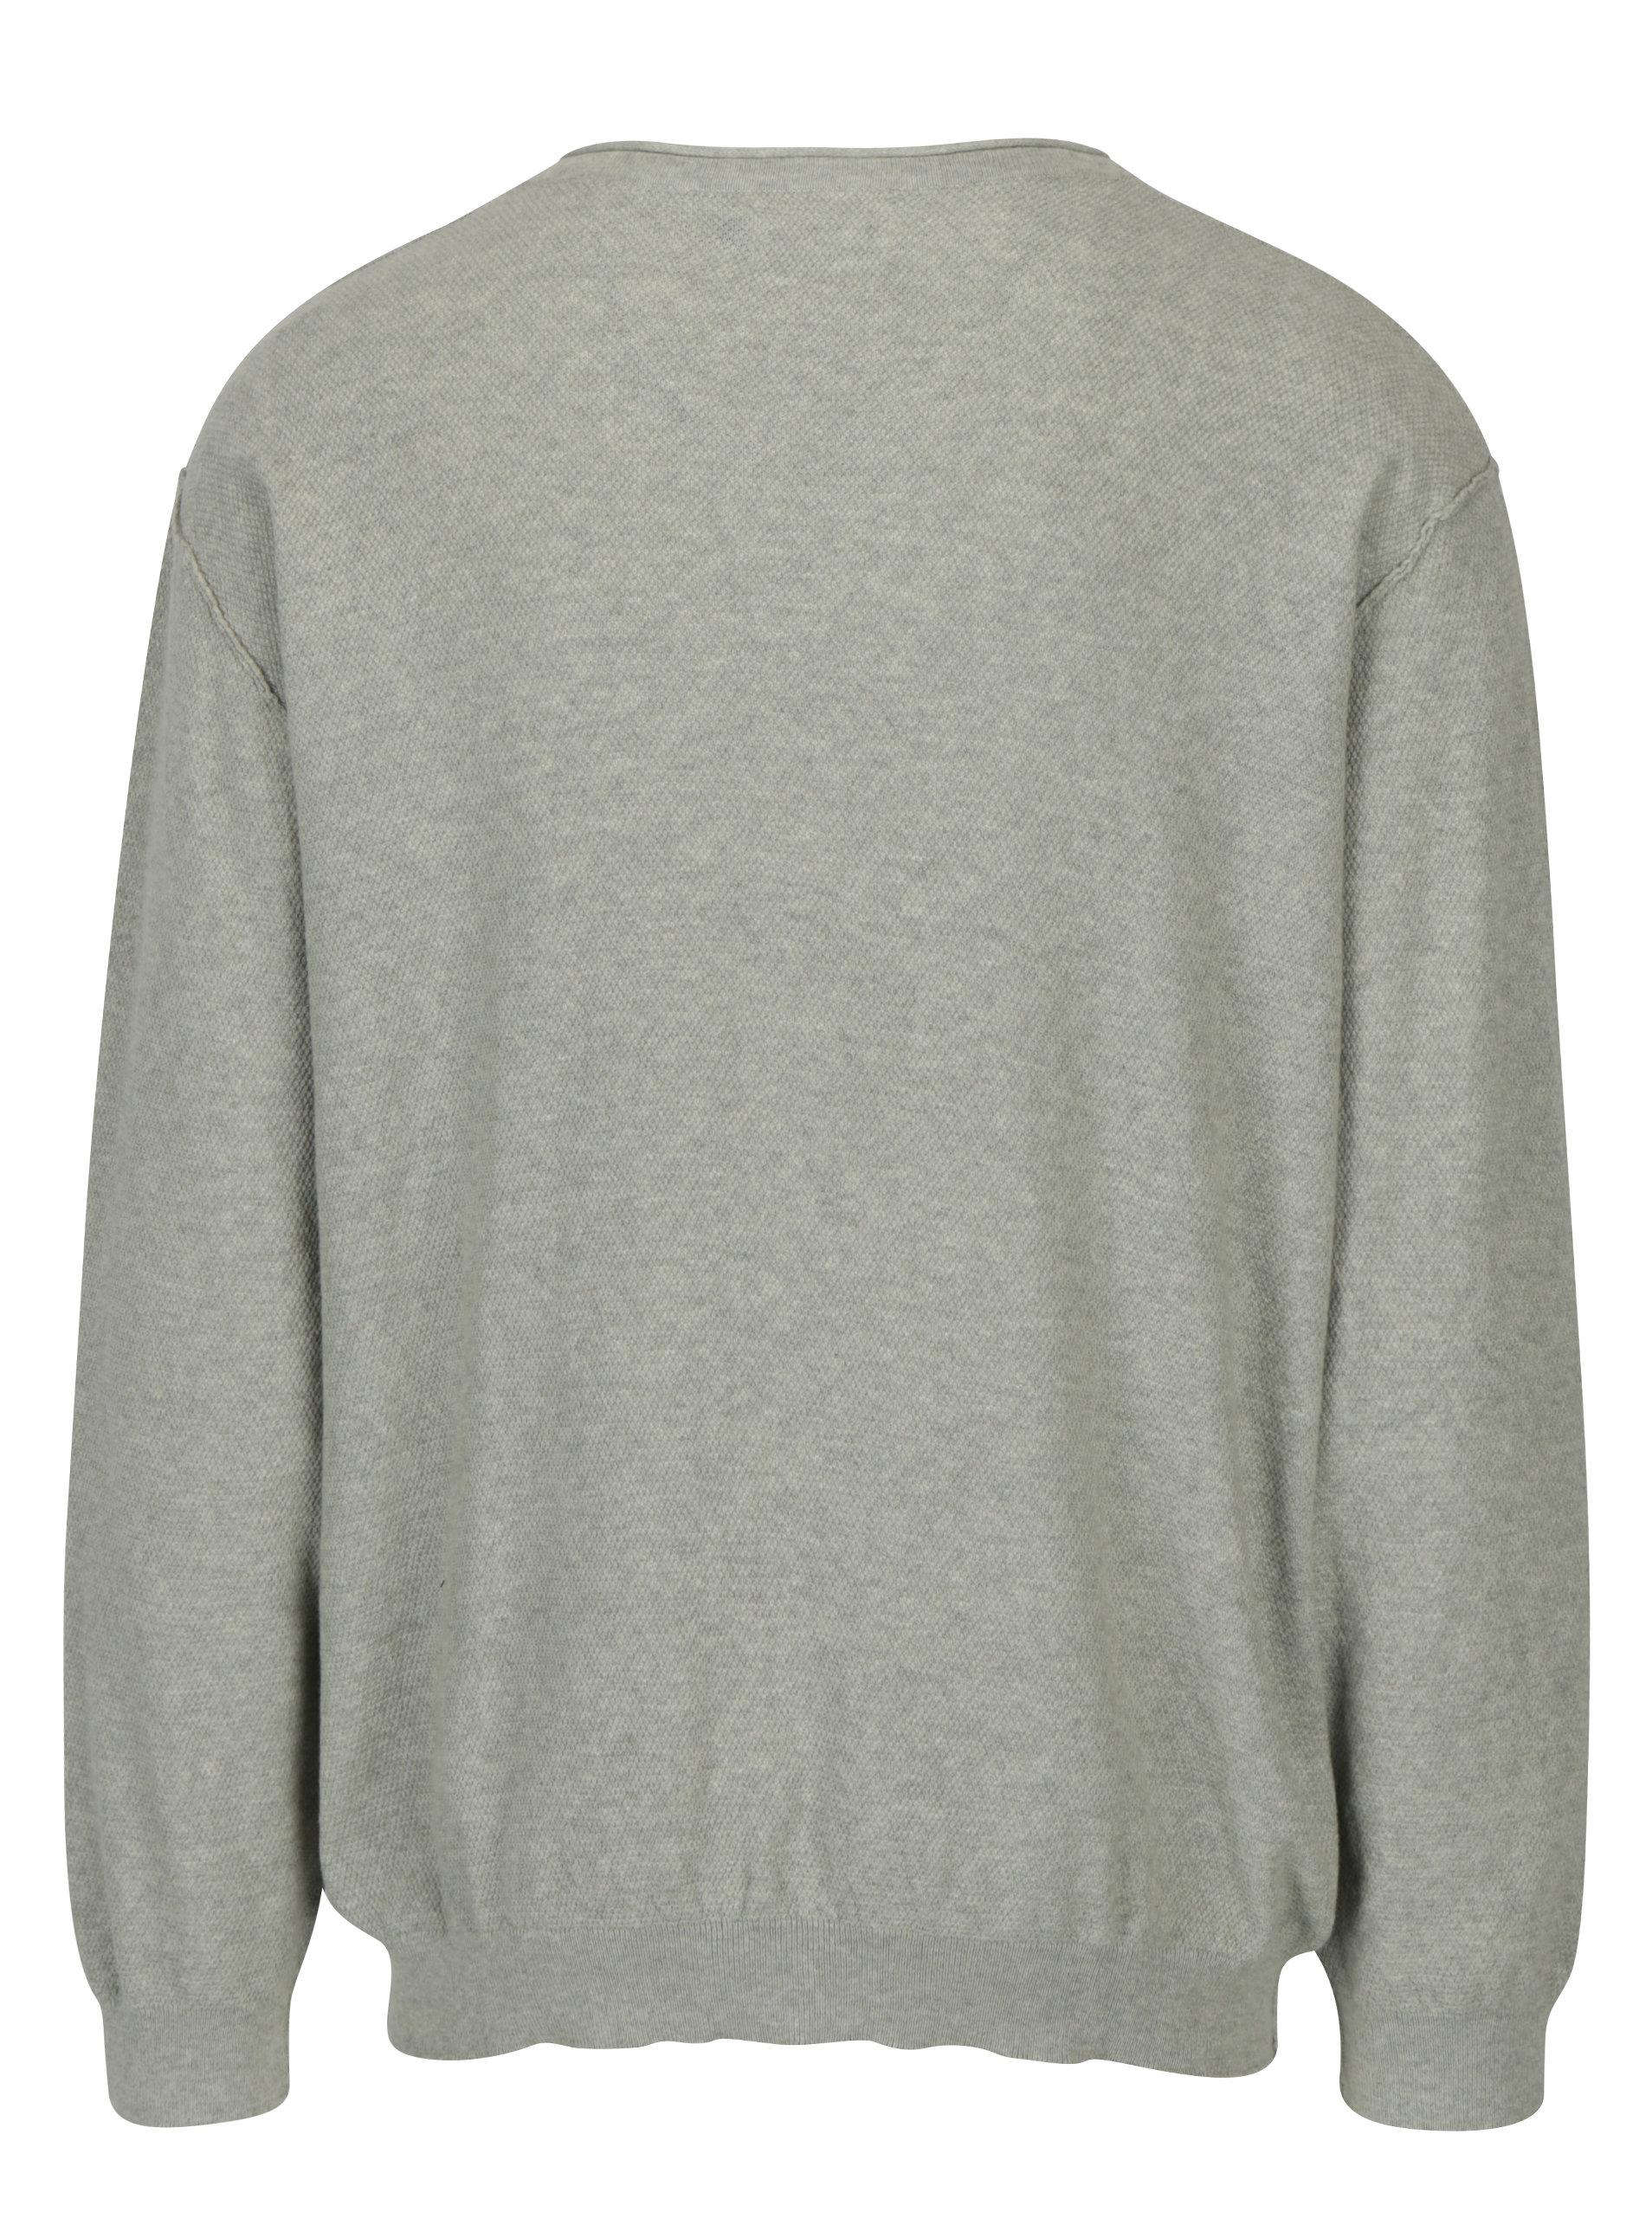 Světle šedý svetr Jack   Jones Nash ... 0460e0d395